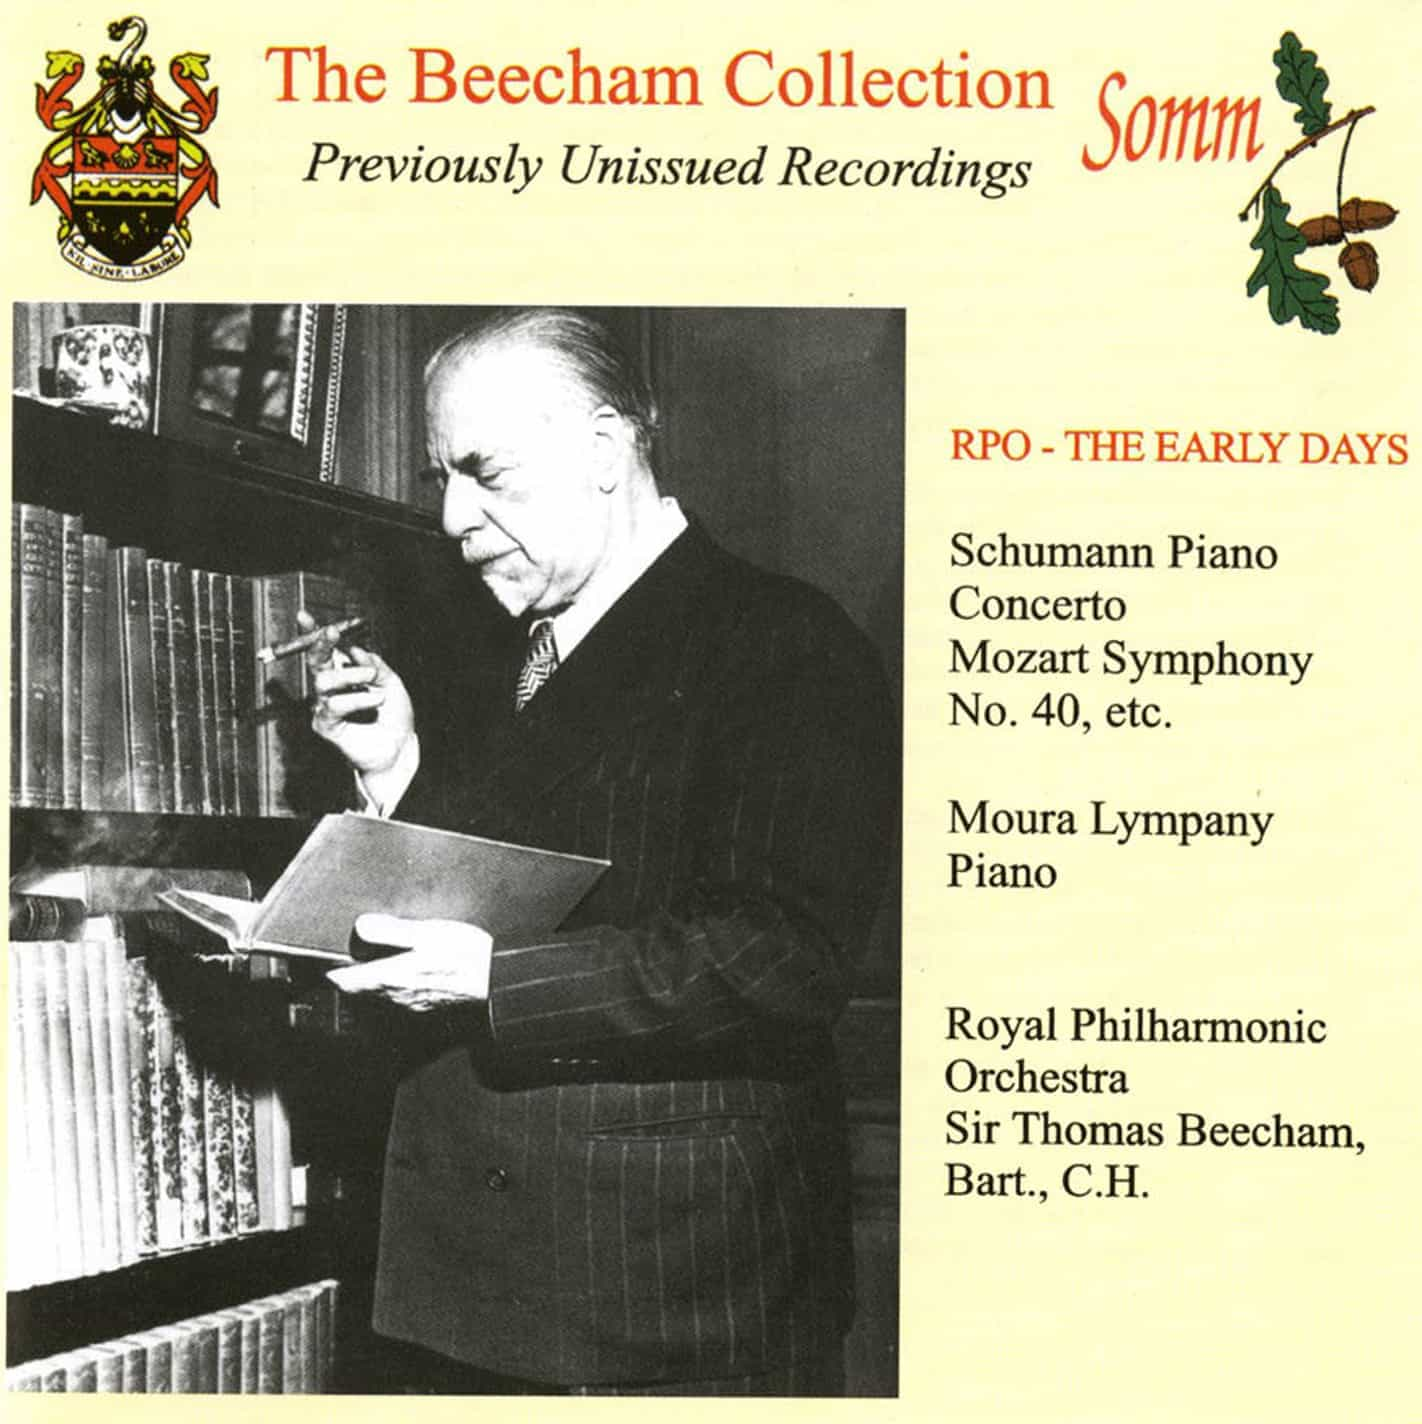 SOMM-BEECHAM 19